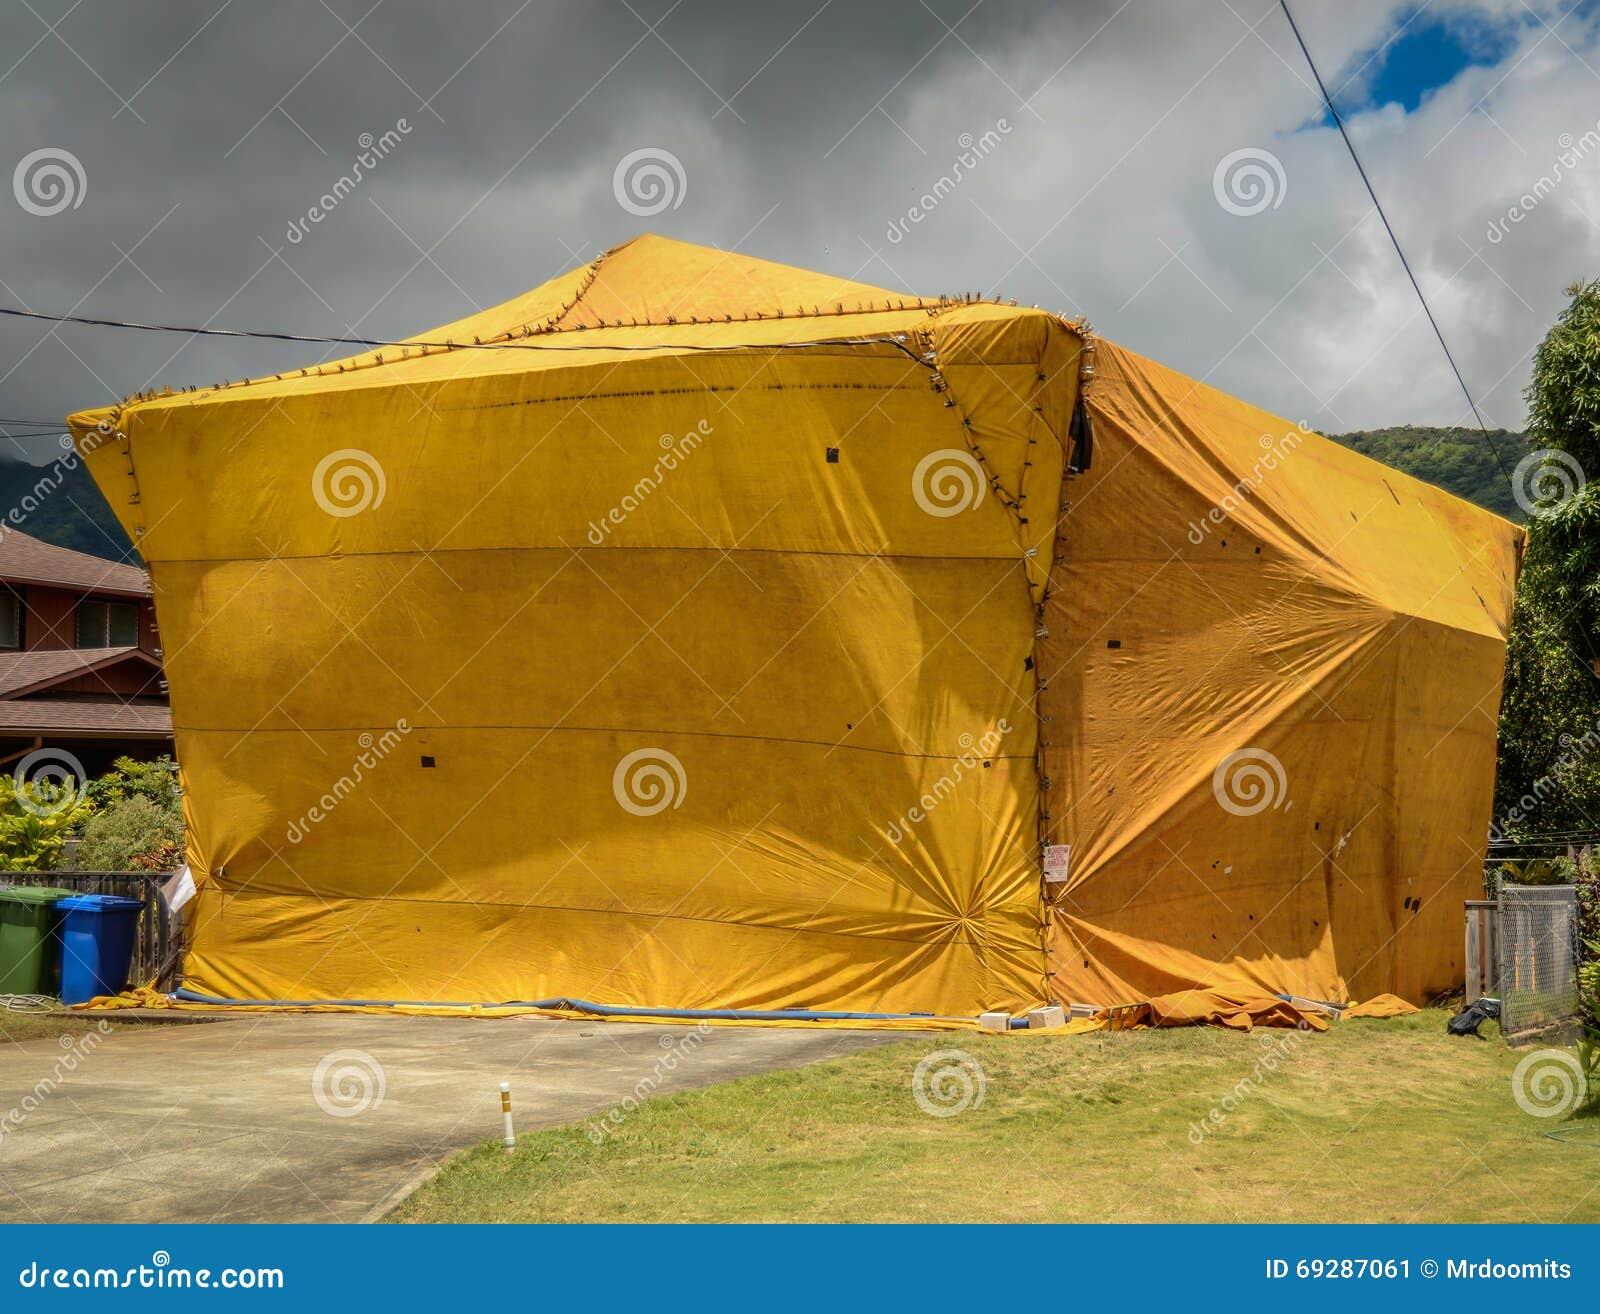 Home Fumigation Pest Control Tent & Home Fumigation Pest Control Tent Stock Photo 69287061 - Megapixl